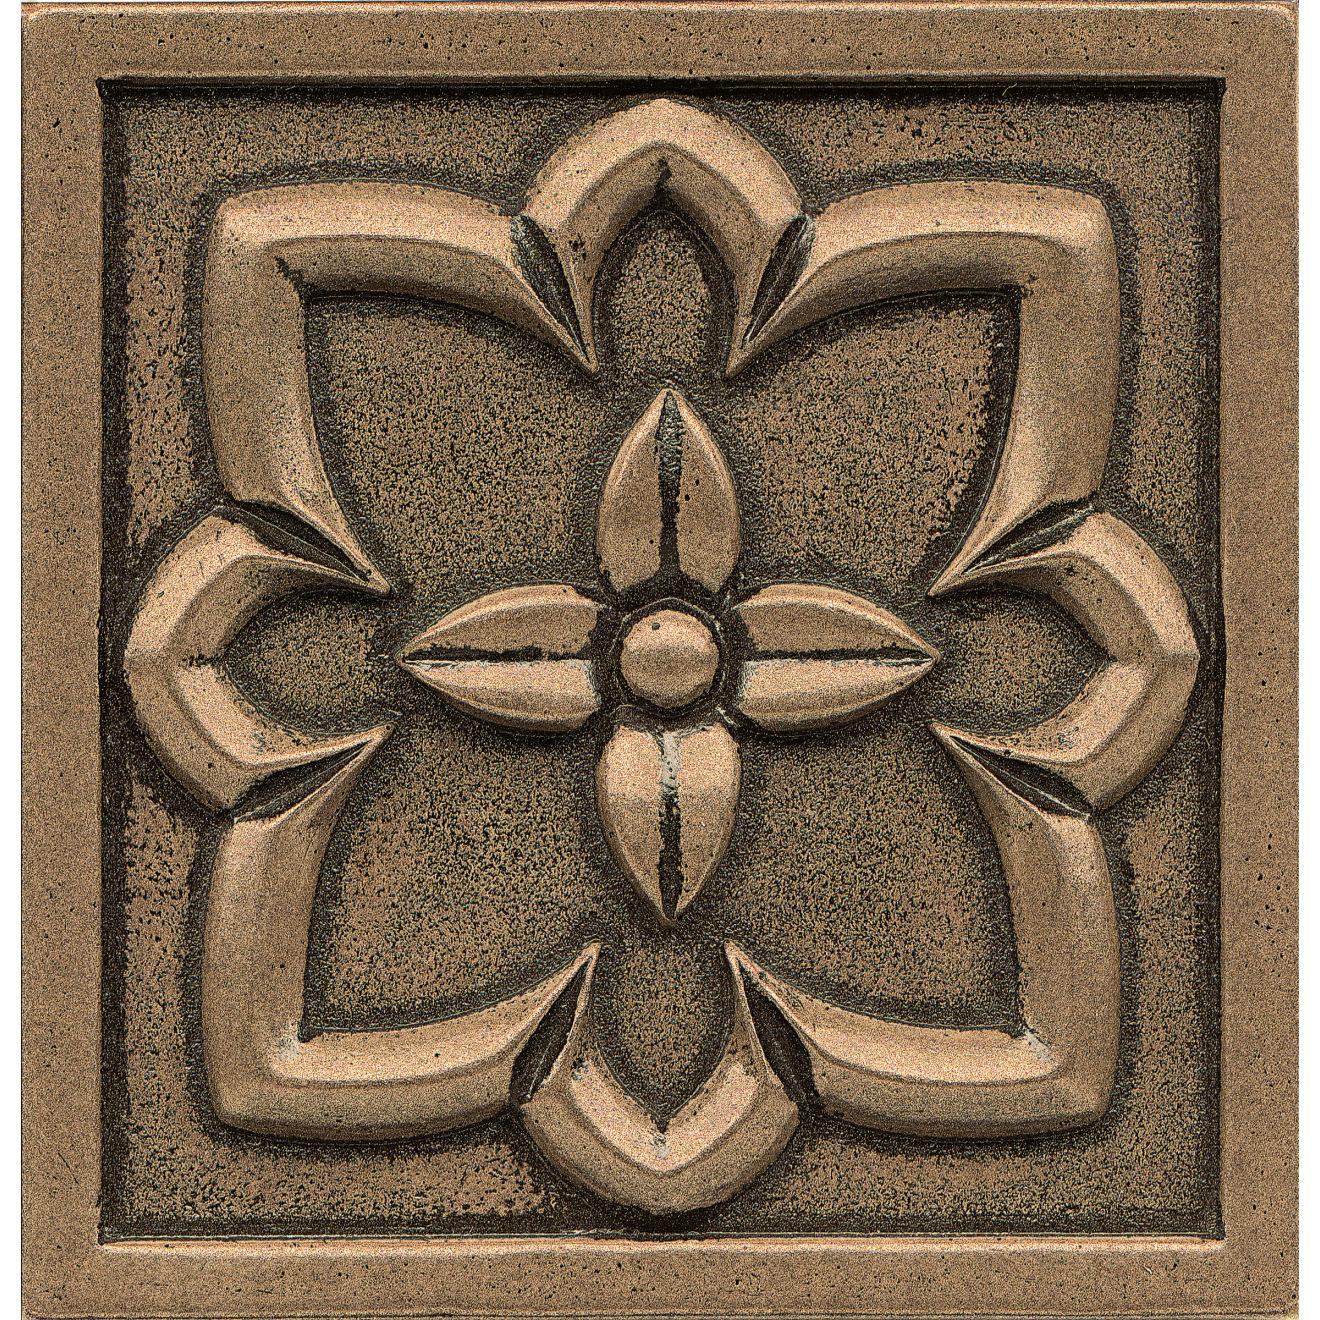 "Ambiance 4"" x 4"" Romanesque Metal Resin Insert in Bronze"